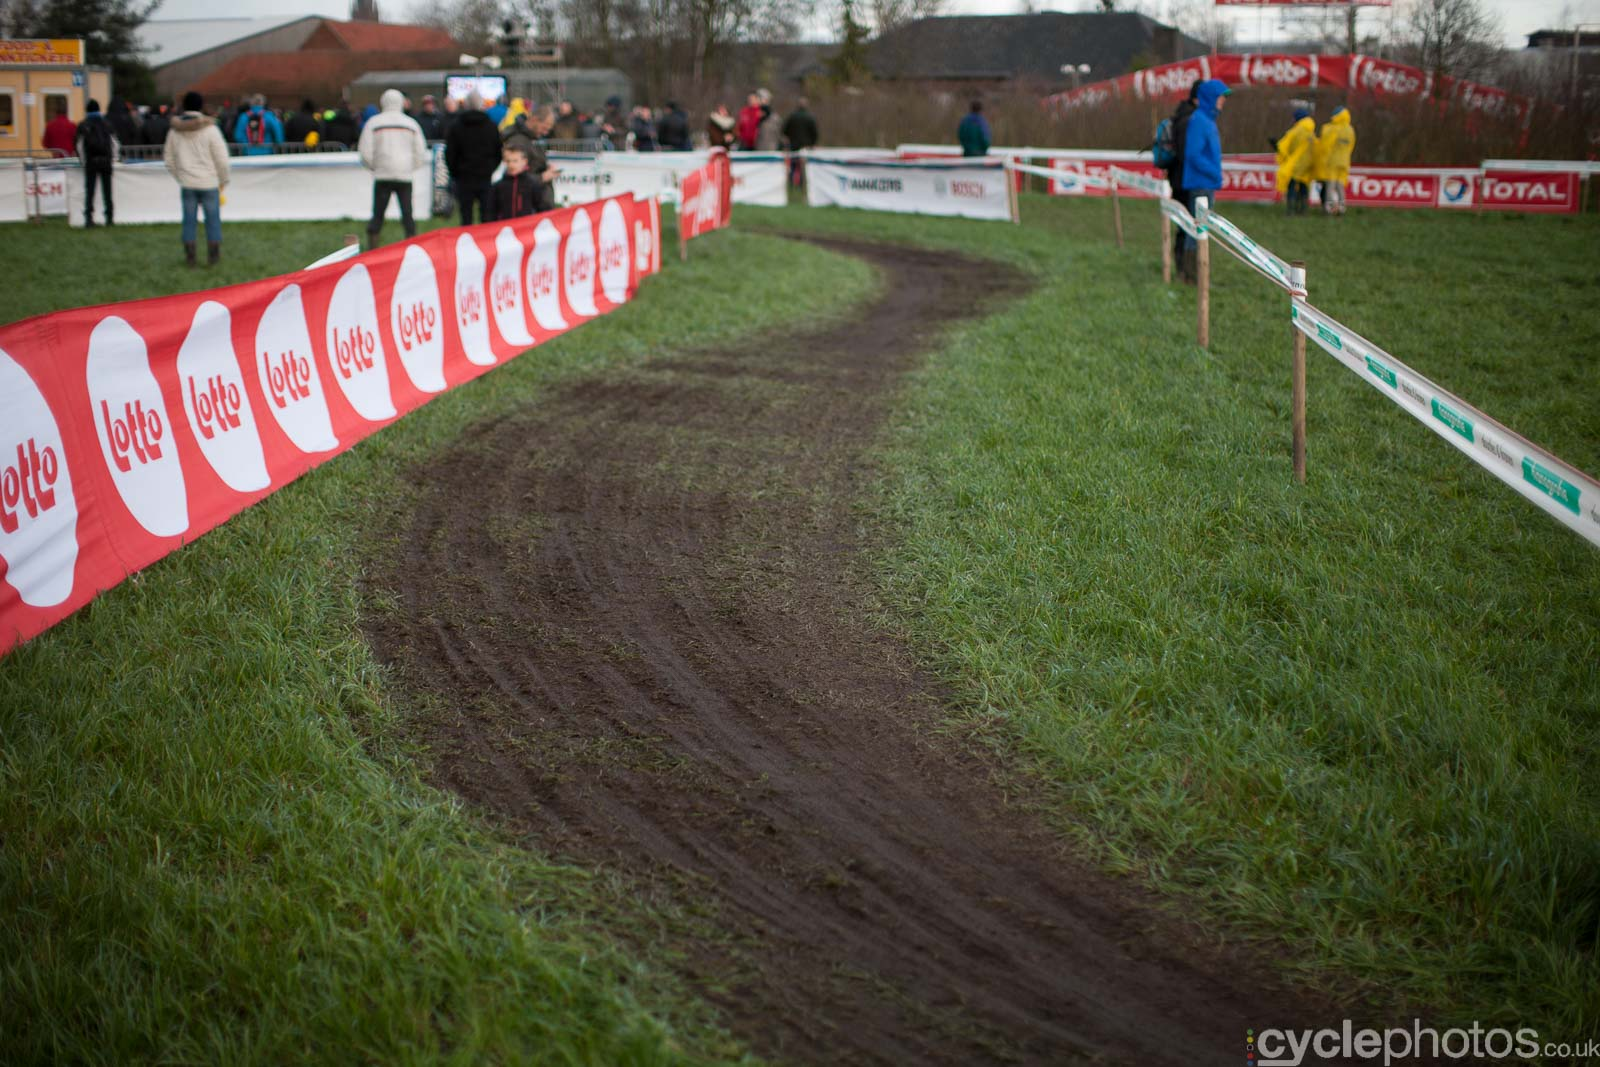 2016-cyclephotos-cyclocross-hoogstraten-152552-line